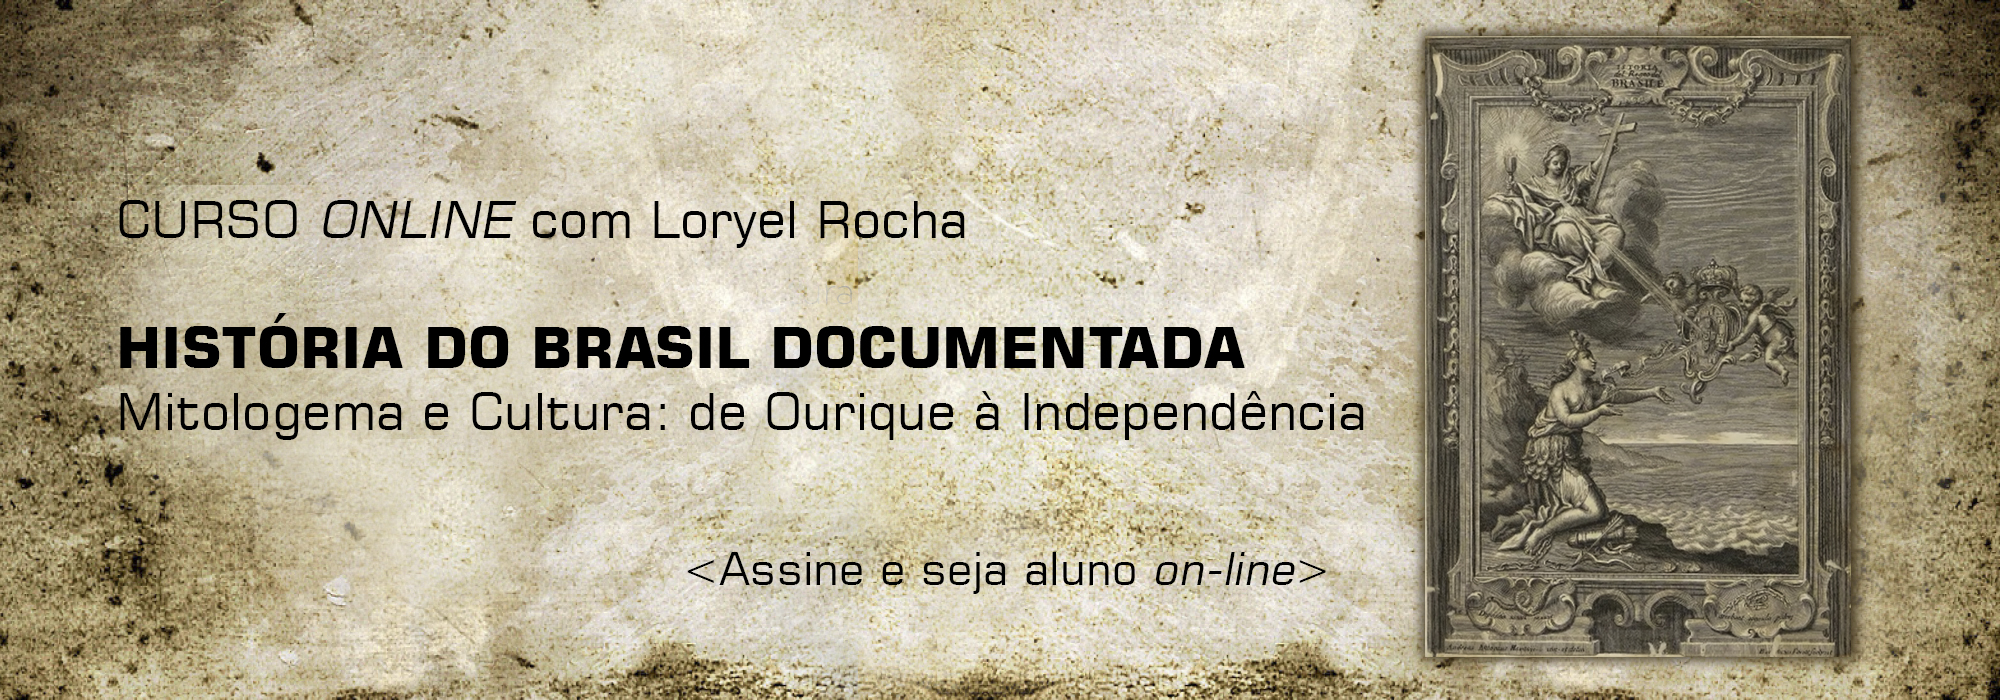 BANNER HISTÓRIA DO BRASIL DOCUMENTADA (1)